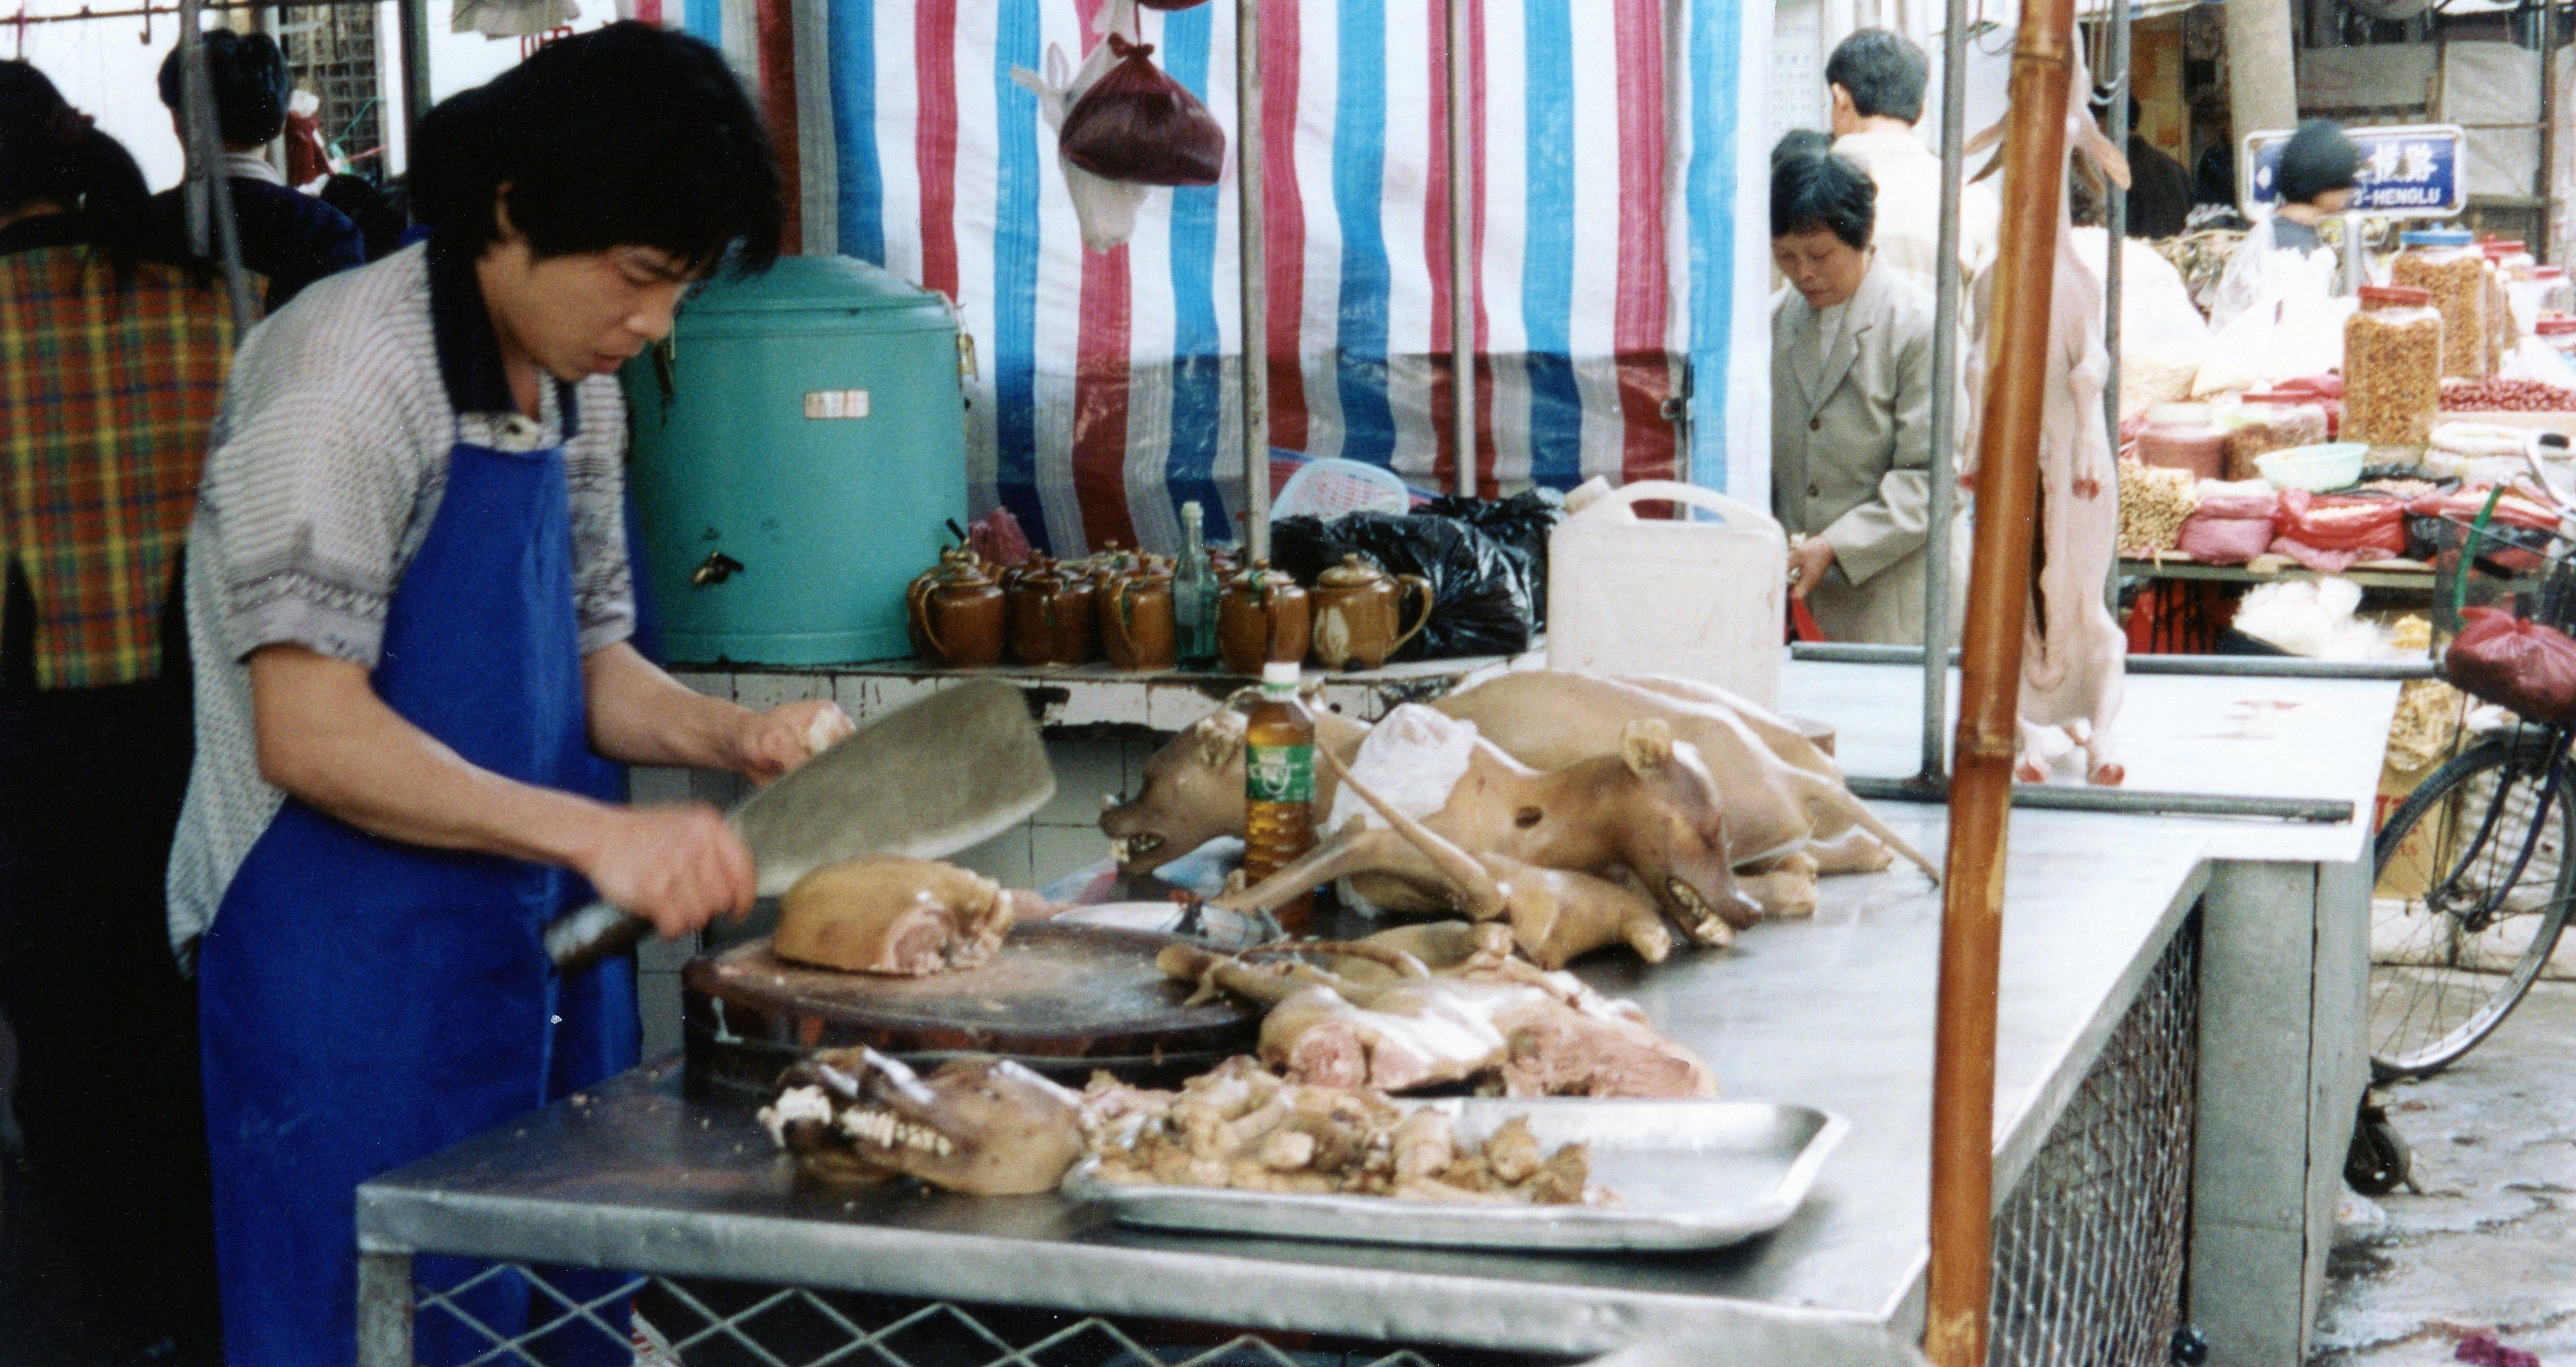 Festiwal Yulin psie mieso chiny